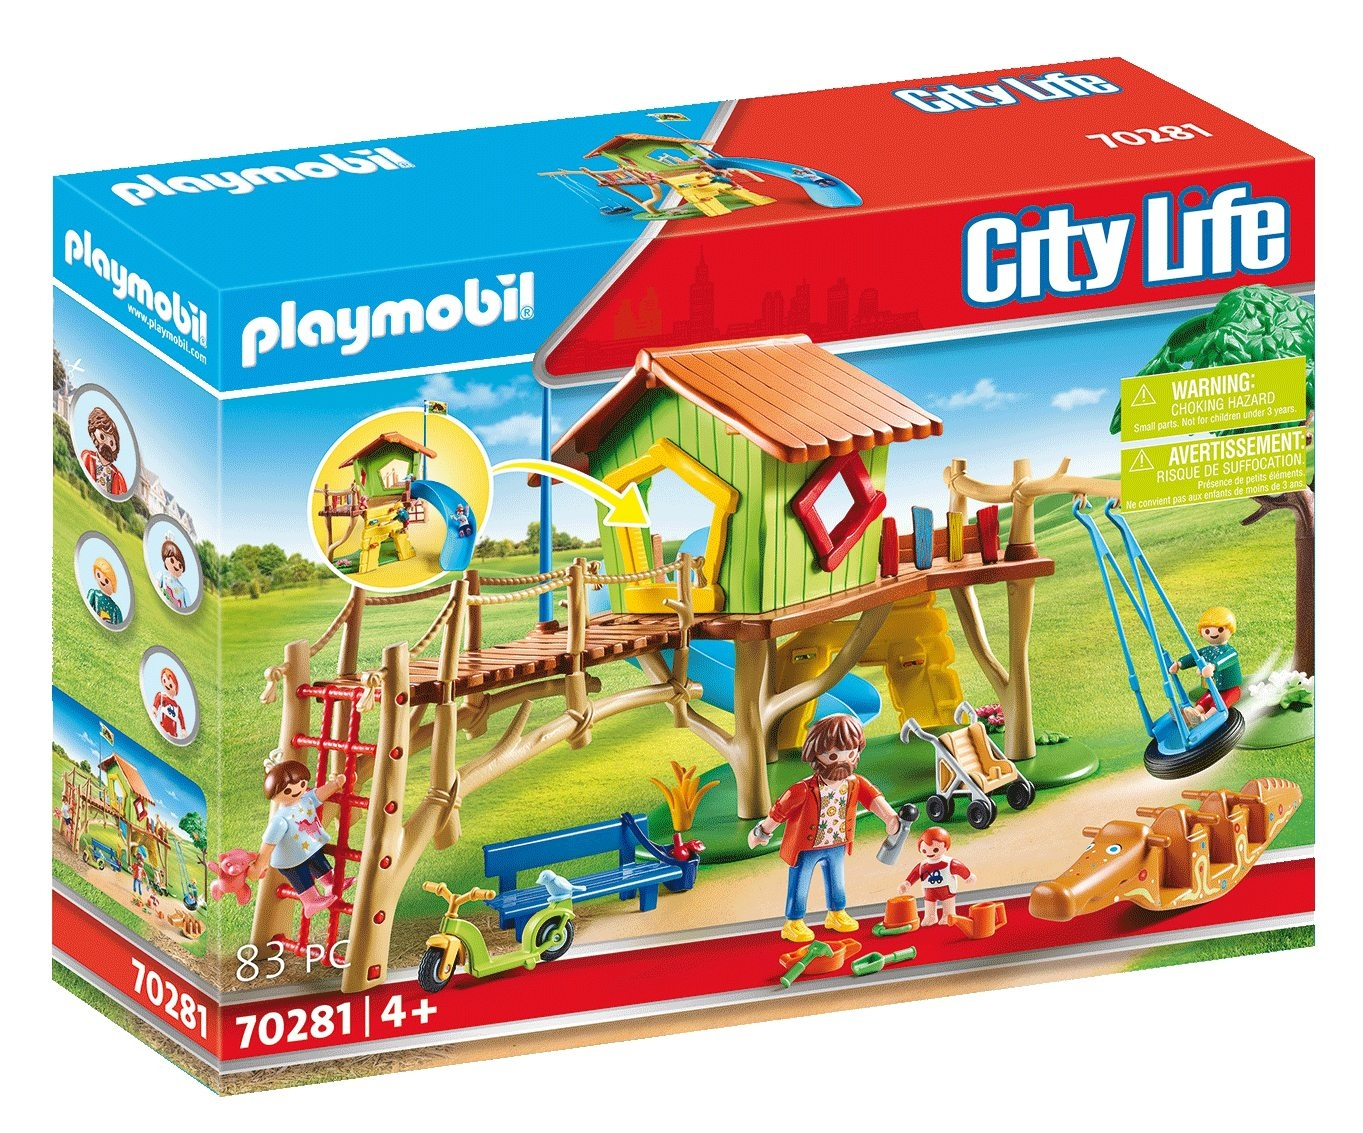 Playmobil City Life: Plac zabaw (70281)